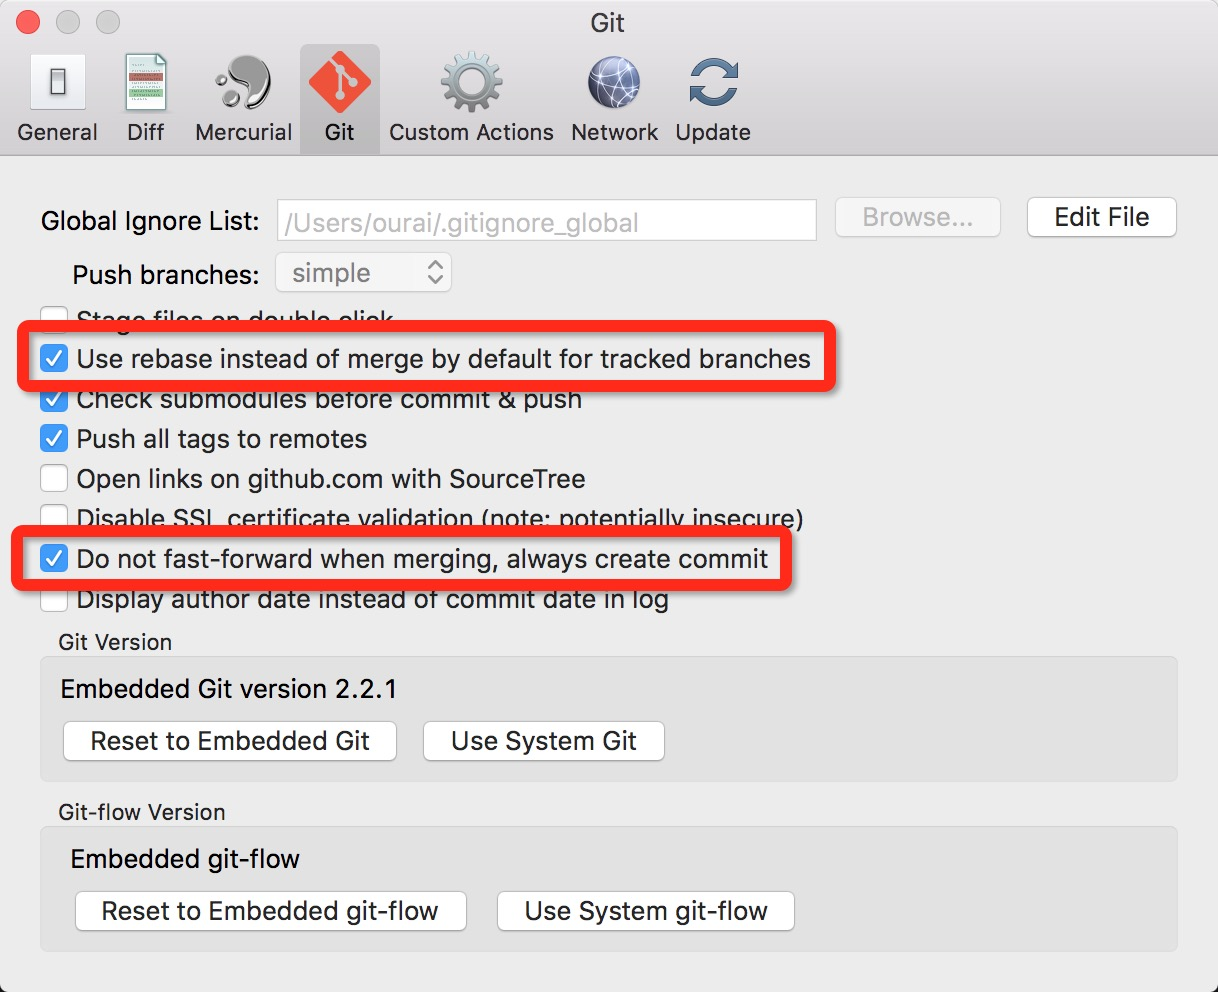 「Preferences」界面的「Git」标签